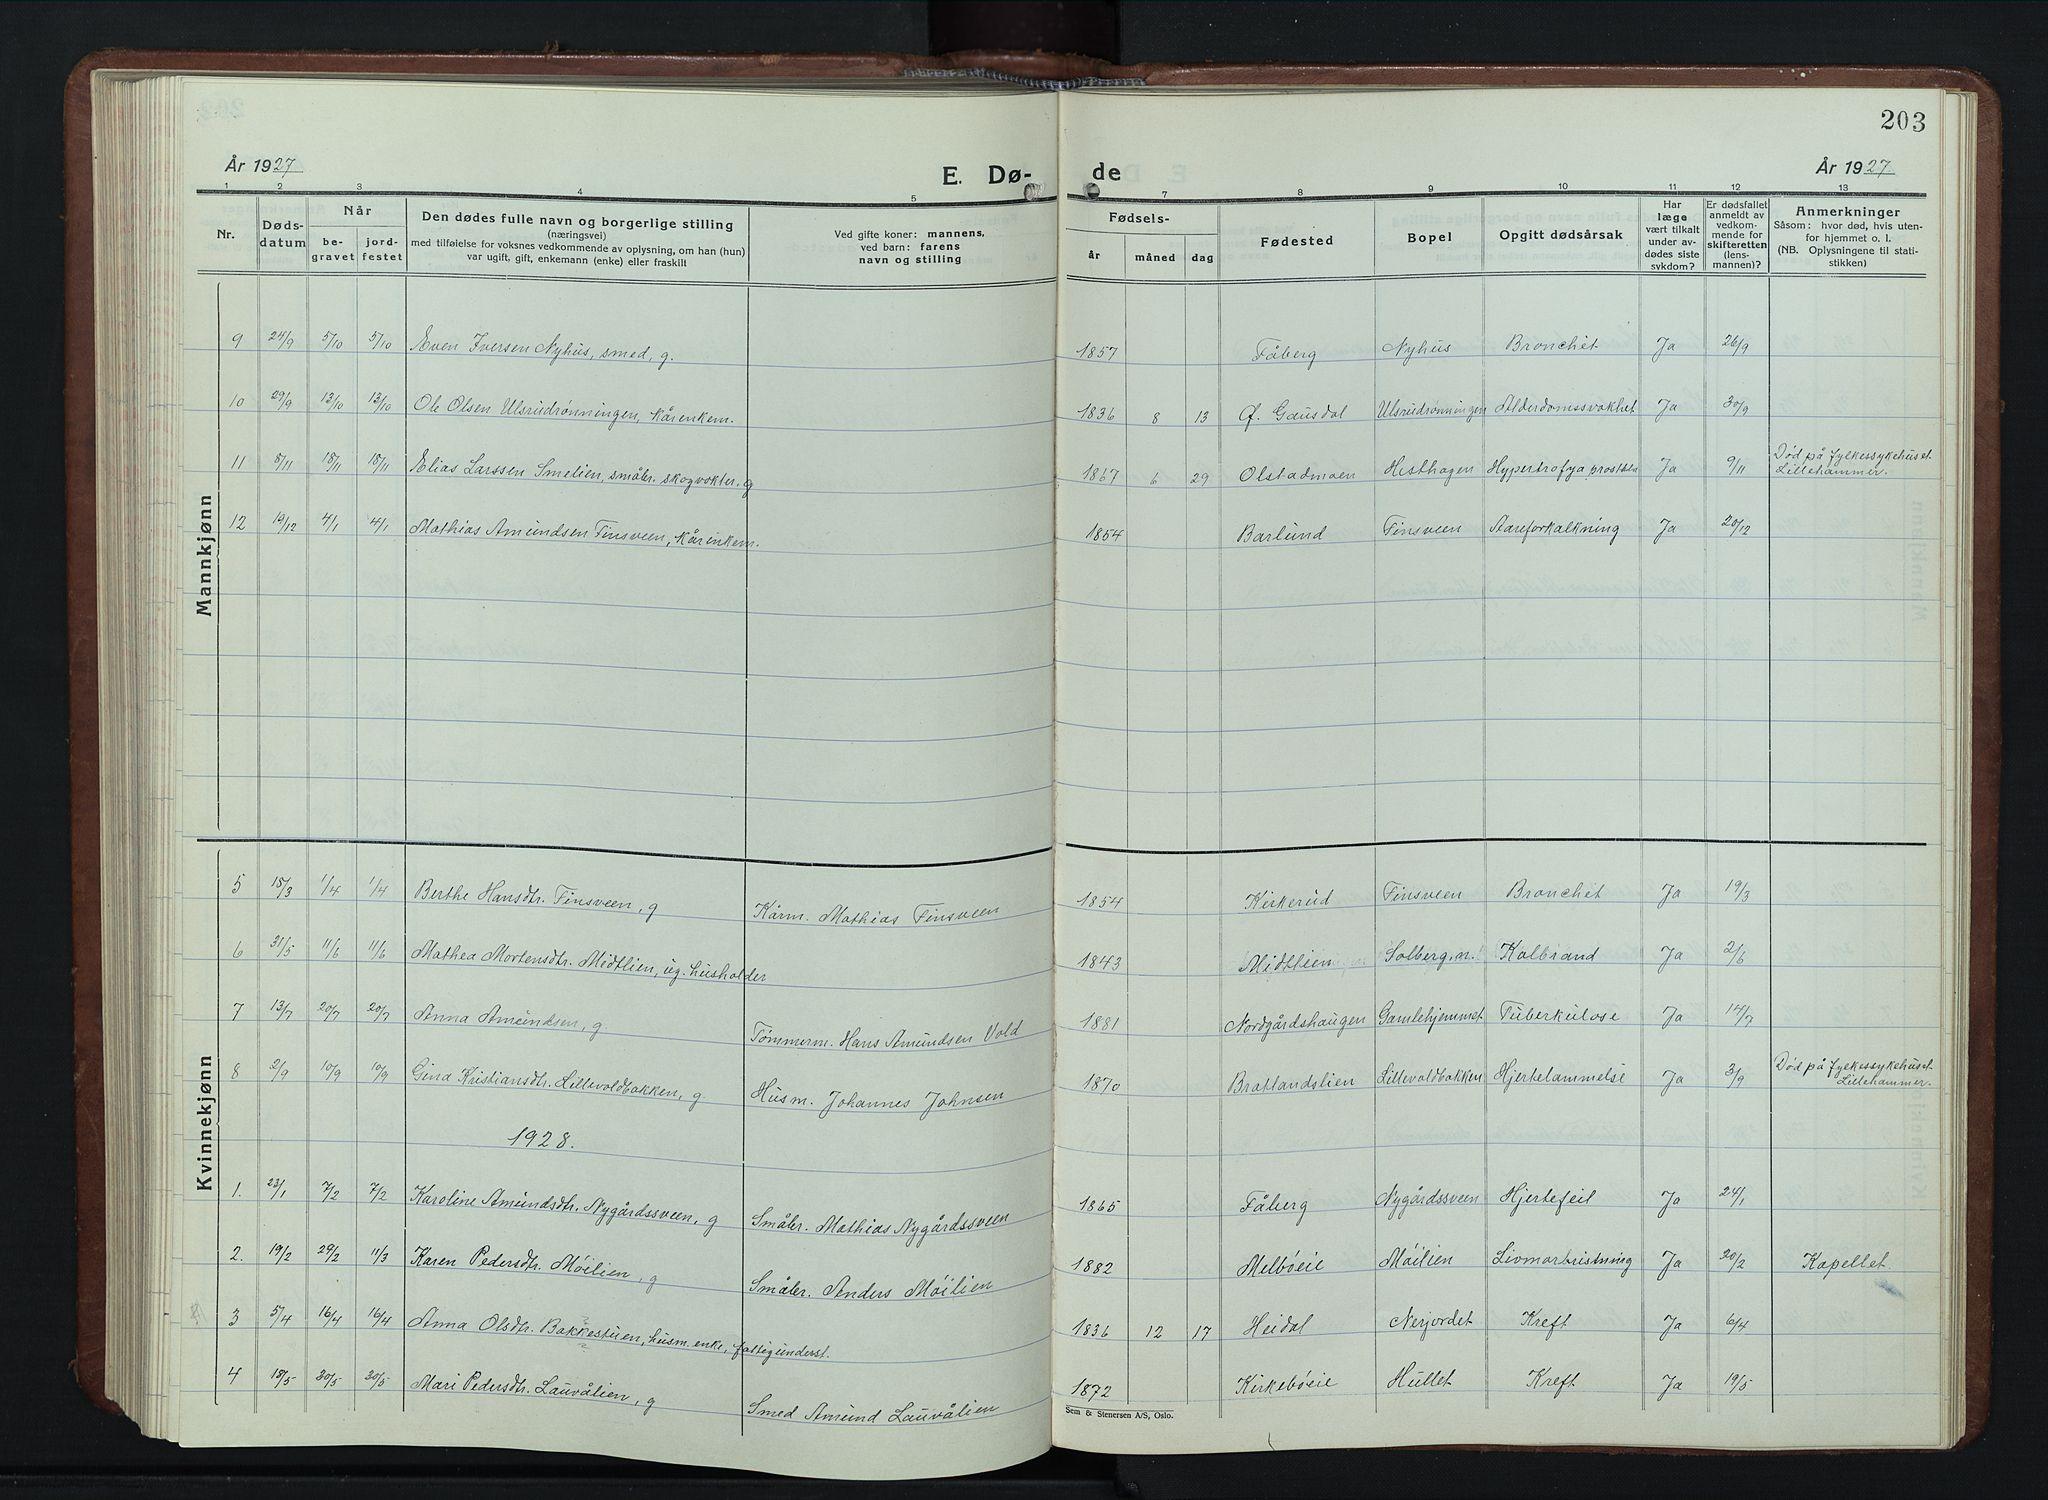 SAH, Vestre Gausdal prestekontor, Klokkerbok nr. 5, 1926-1955, s. 203